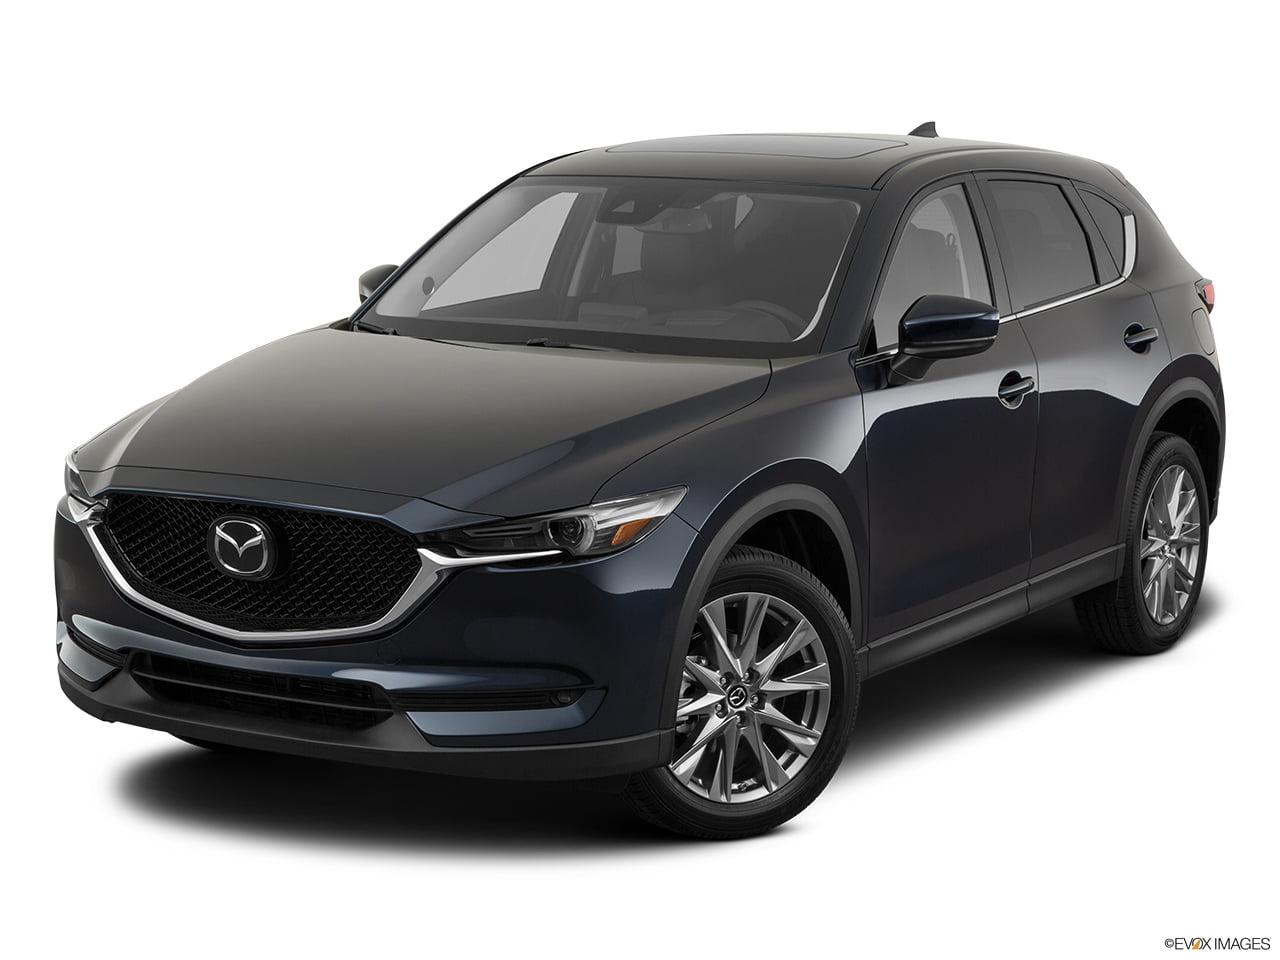 2020 mazda cx-5 leasing (best car lease deals & specials